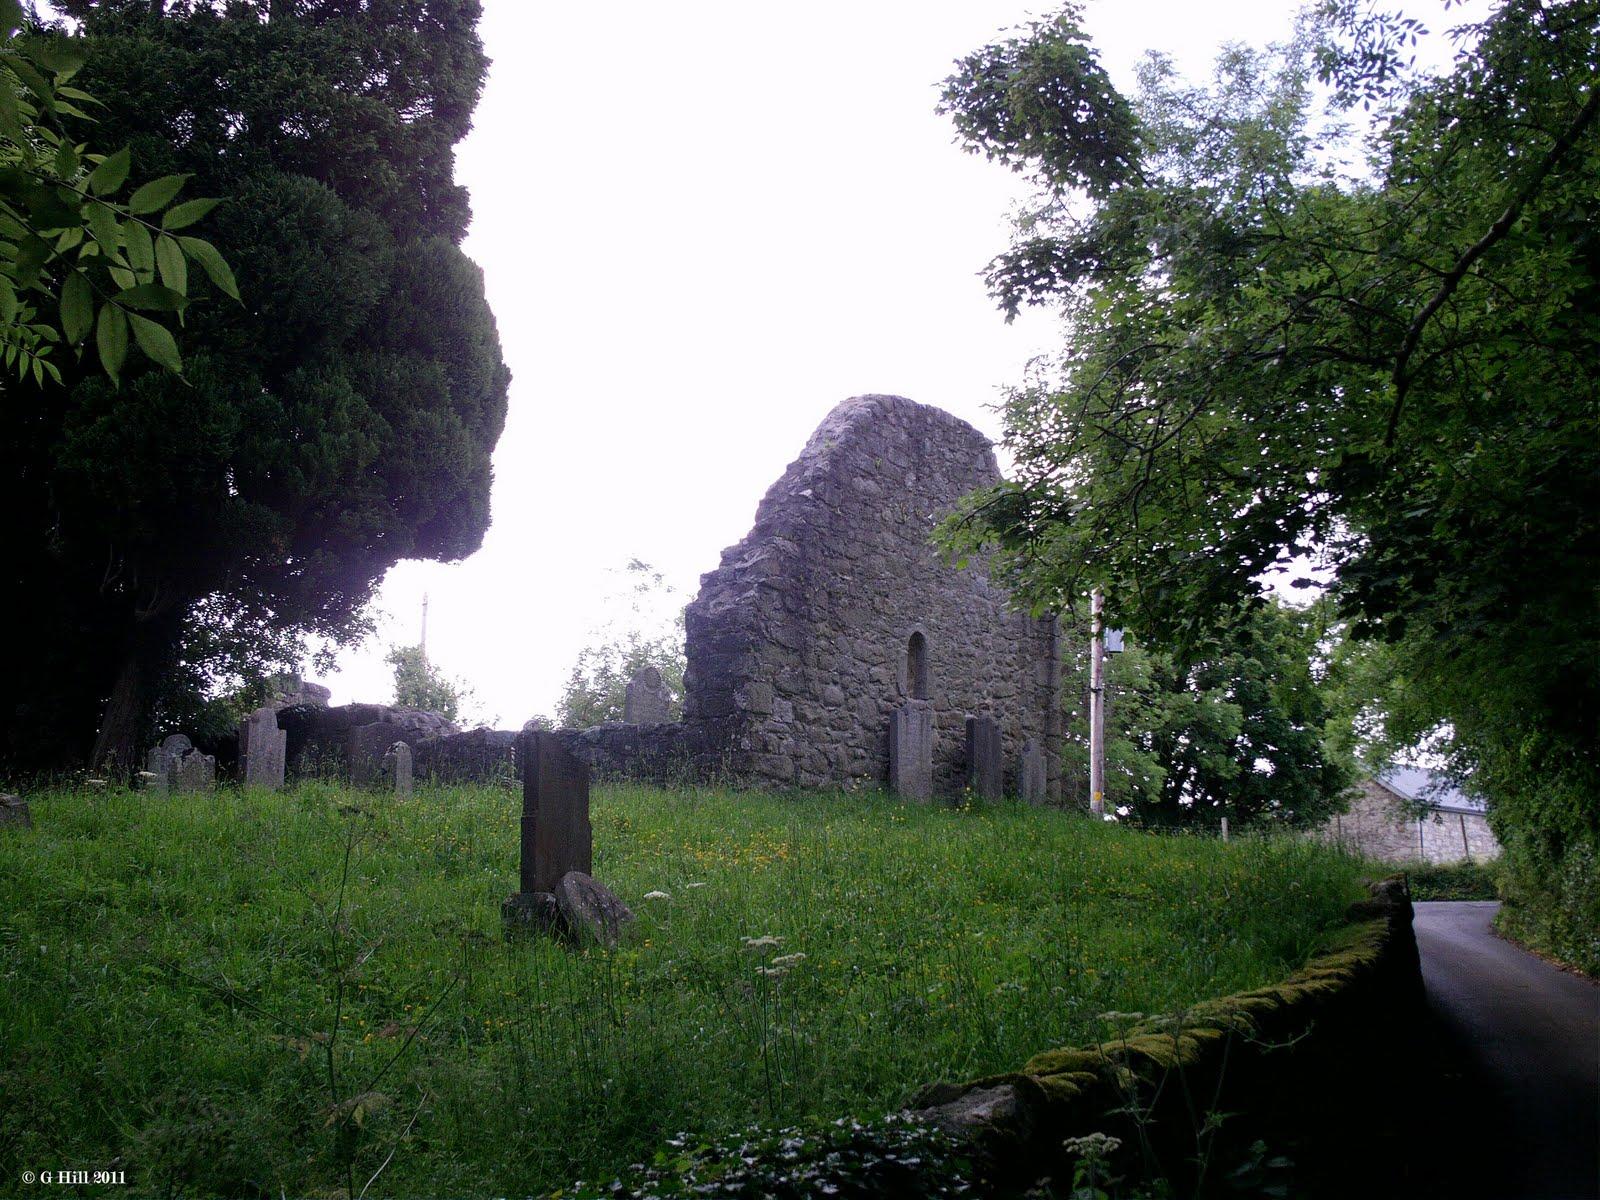 Blue Church Kilternan Church of Kilternan